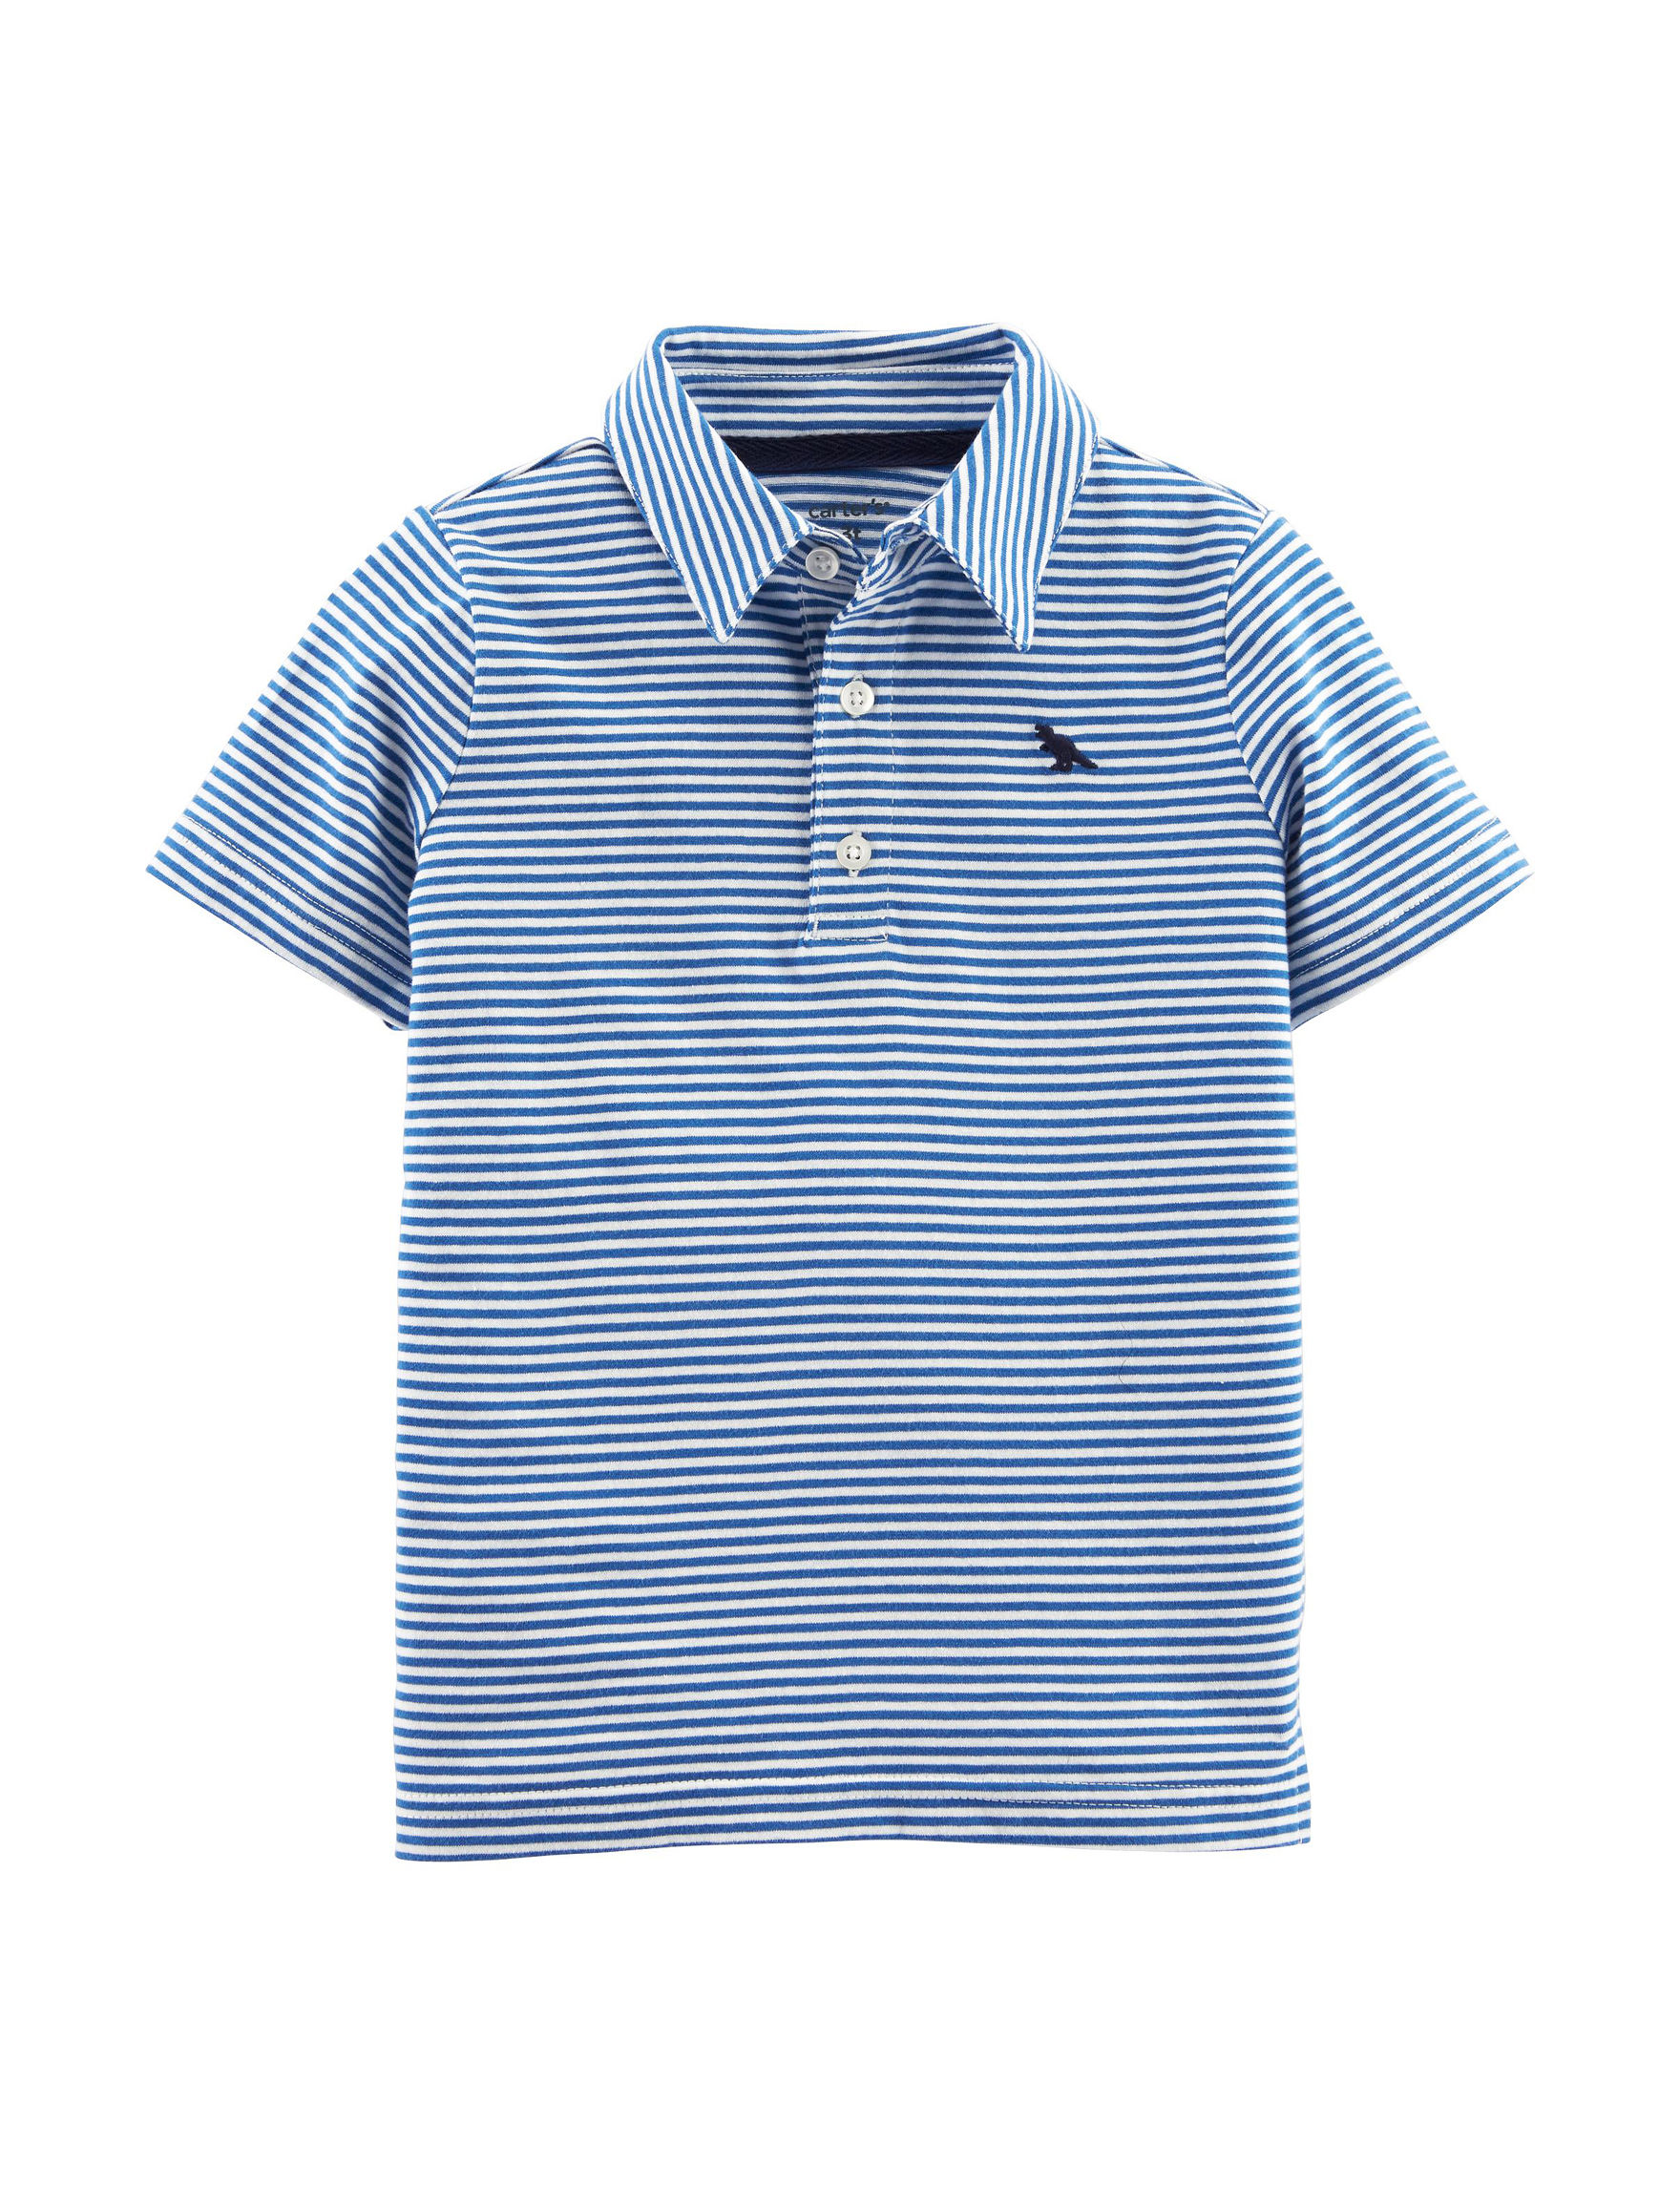 Carter's Blue Stripe